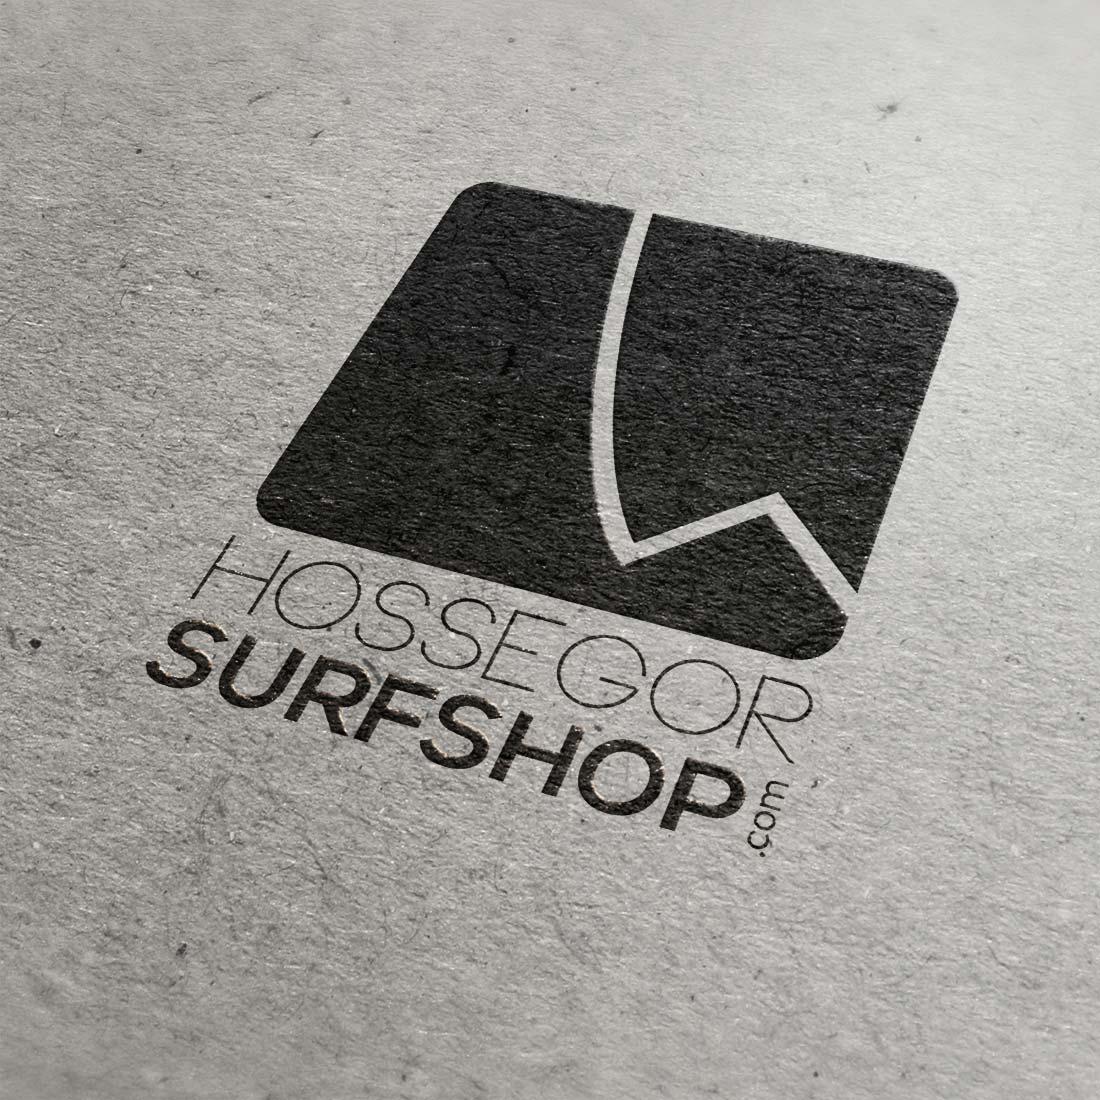 Création identité visuelle logo Hossegor Surfshop